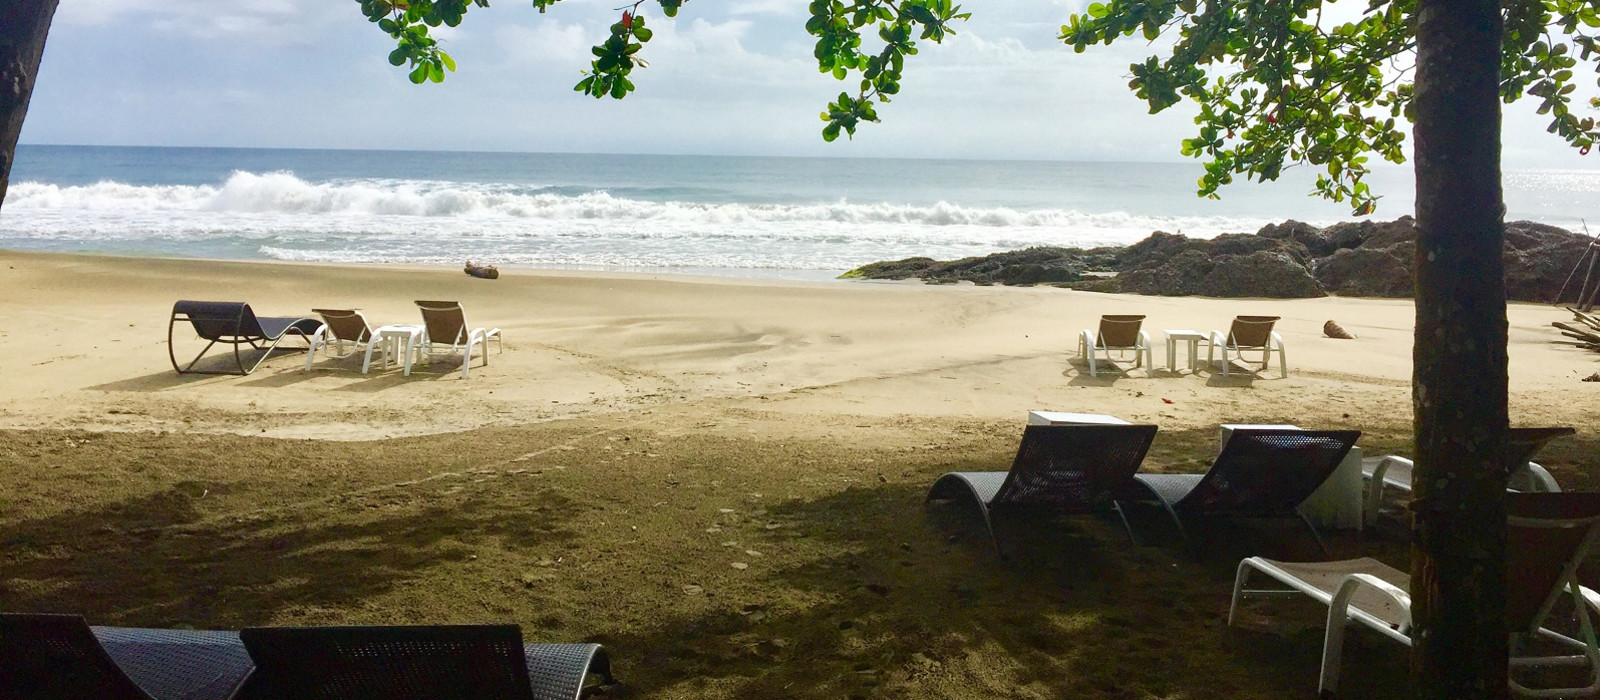 Overland Costa Rica: Off the Beaten Path Tour Trip 1